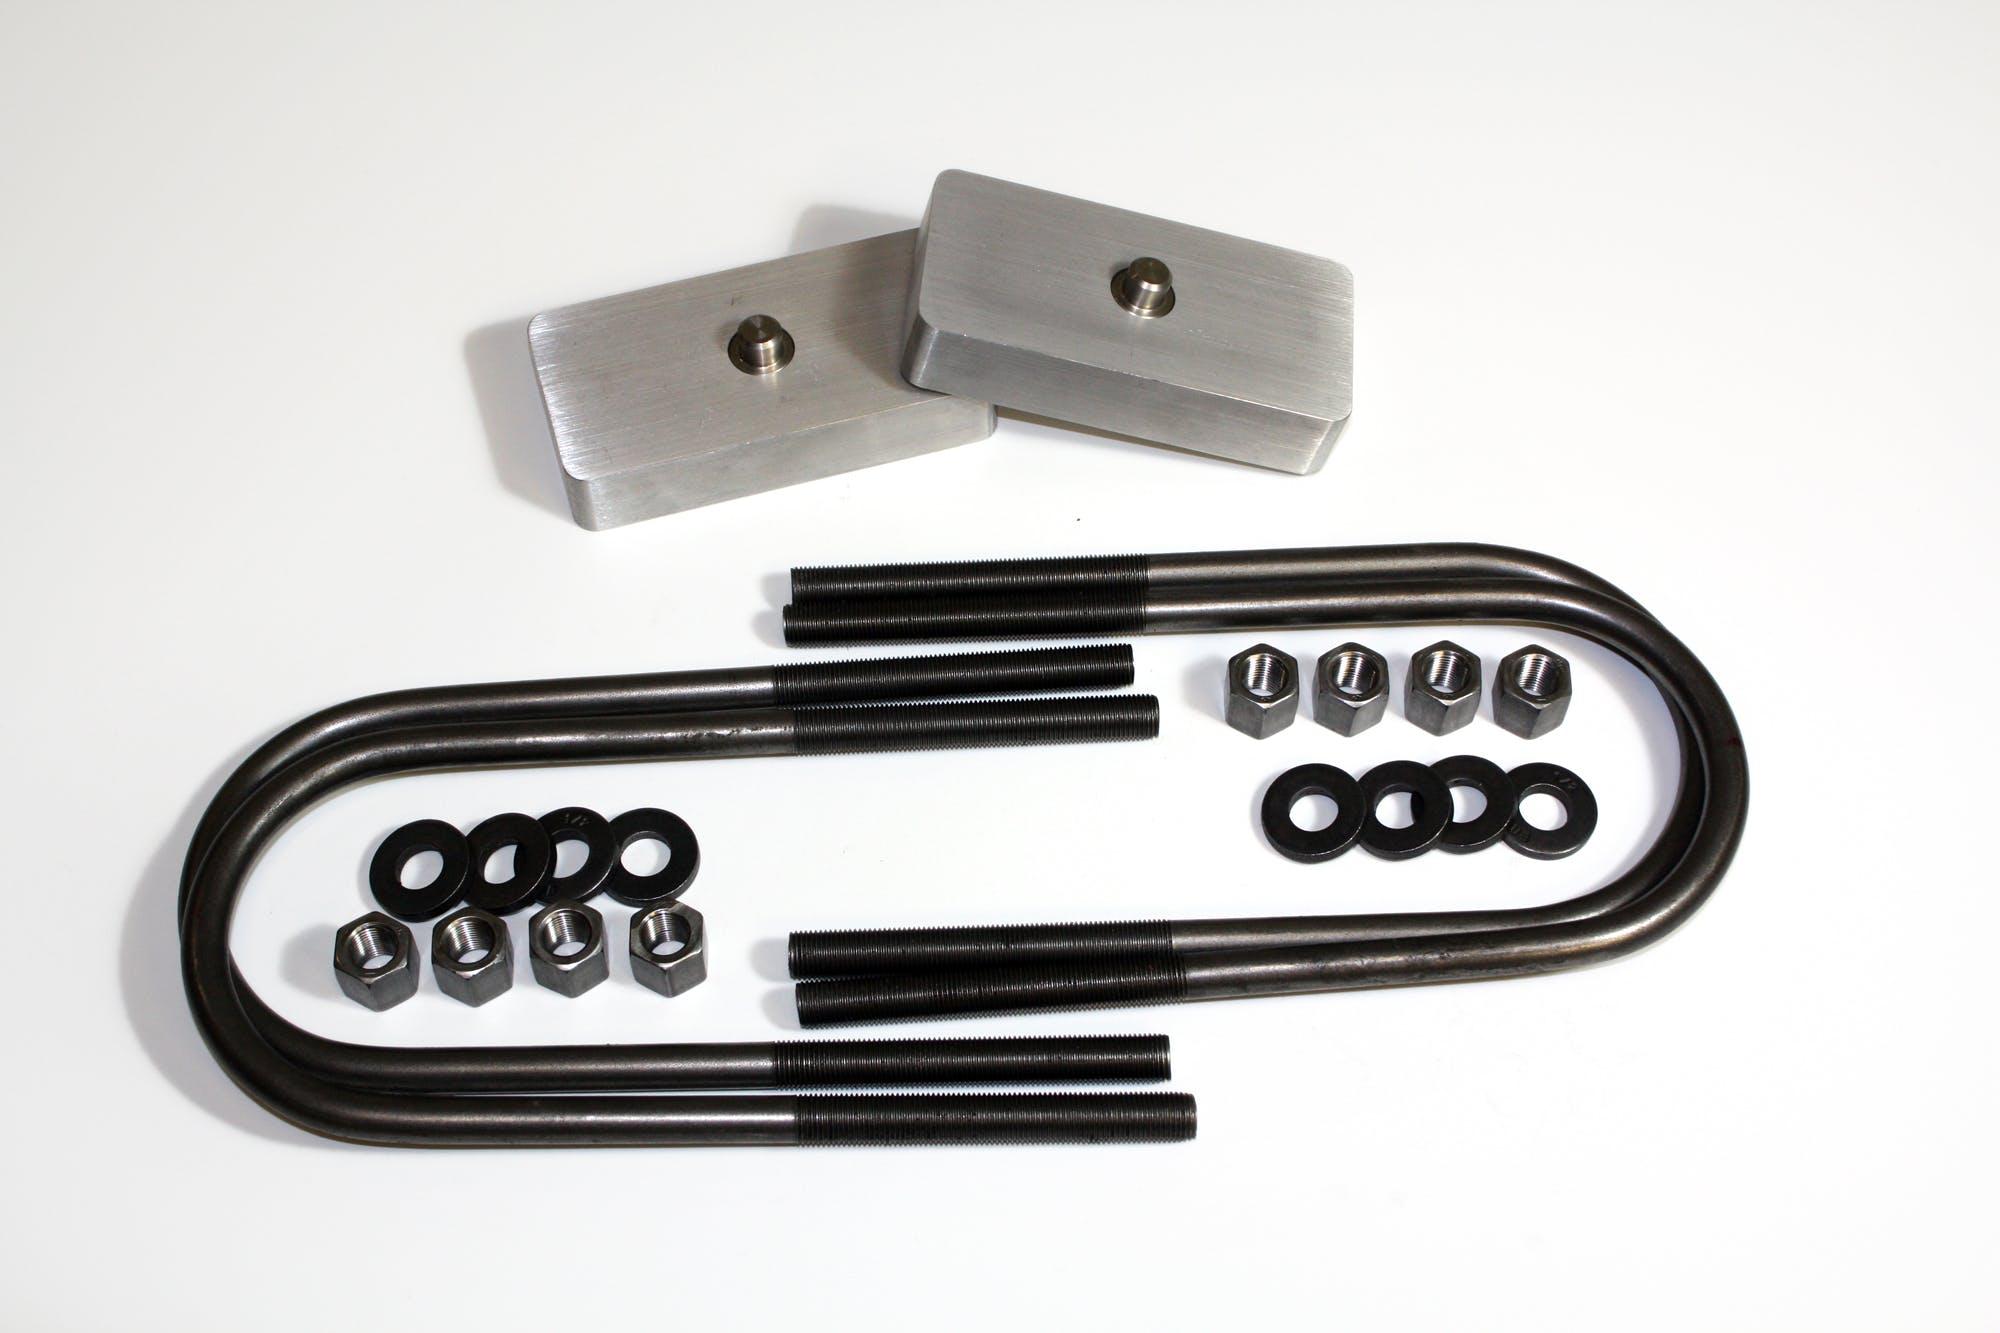 Rugged Off Road 5-5004 Rear Block Kit